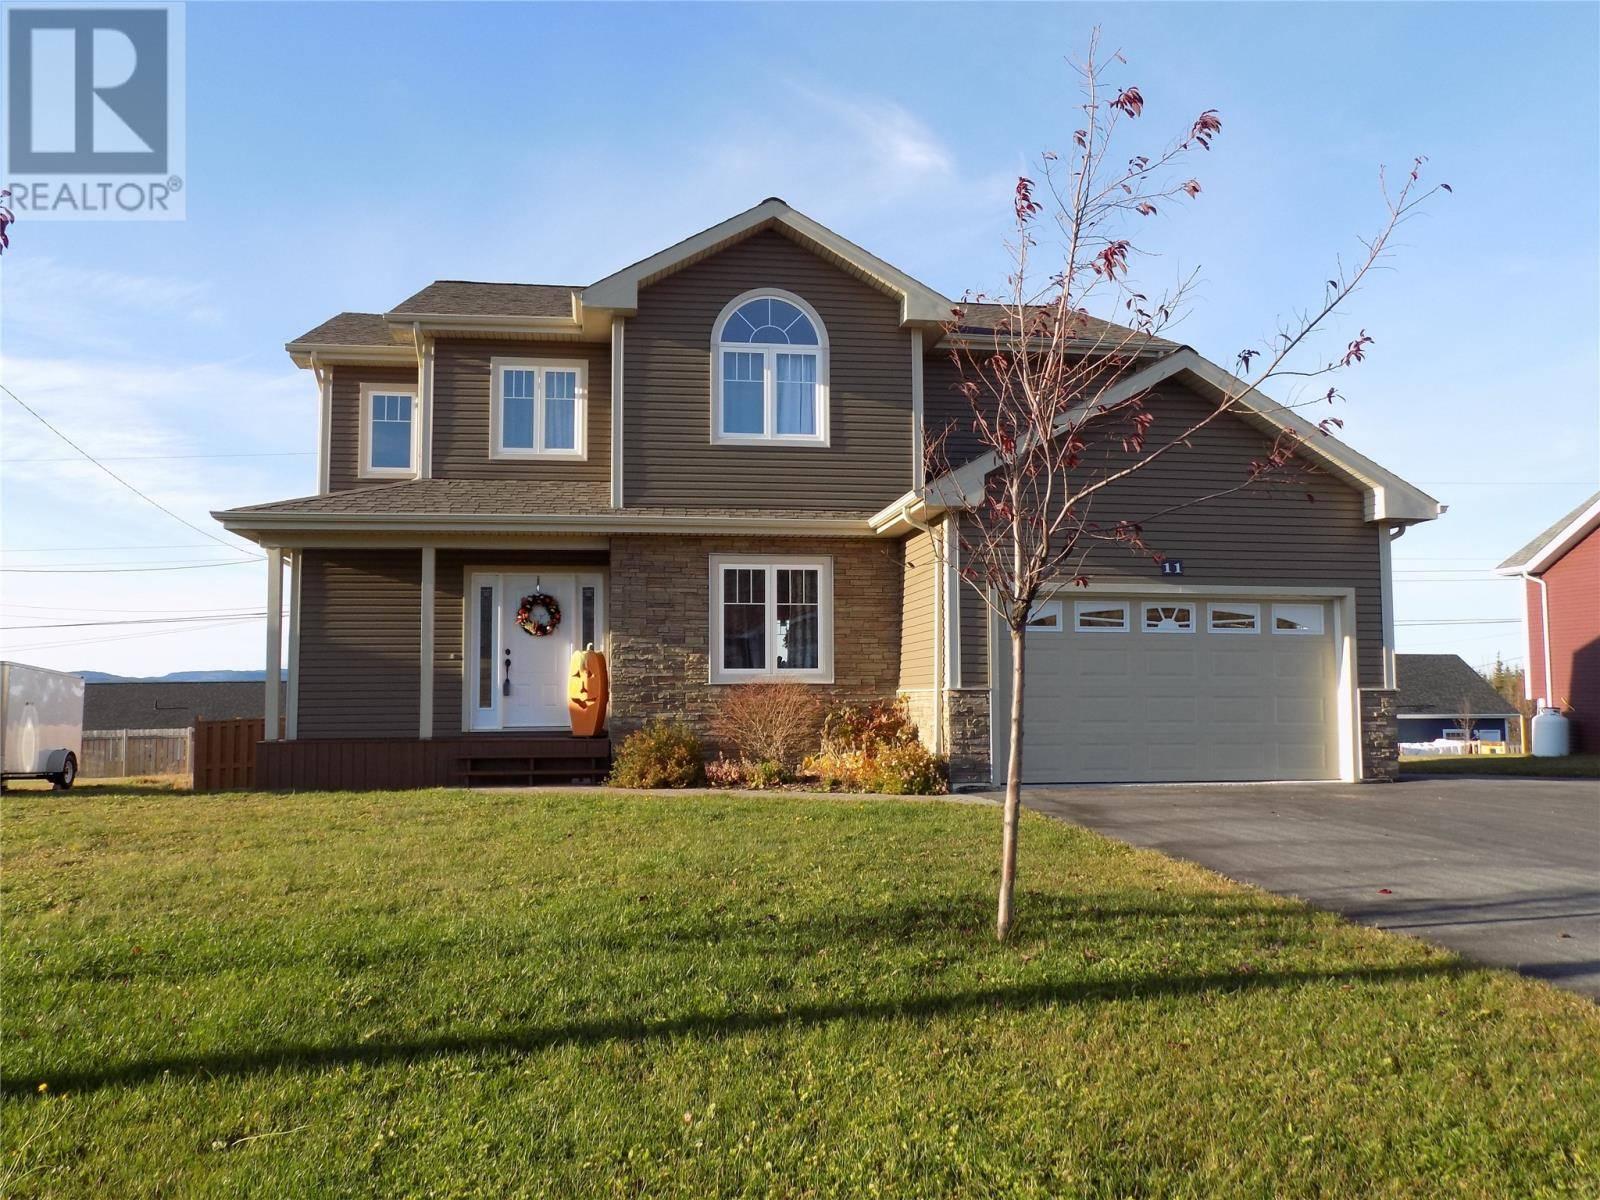 House for sale at 11 Penney Dr Pasadena Newfoundland - MLS: 1210181